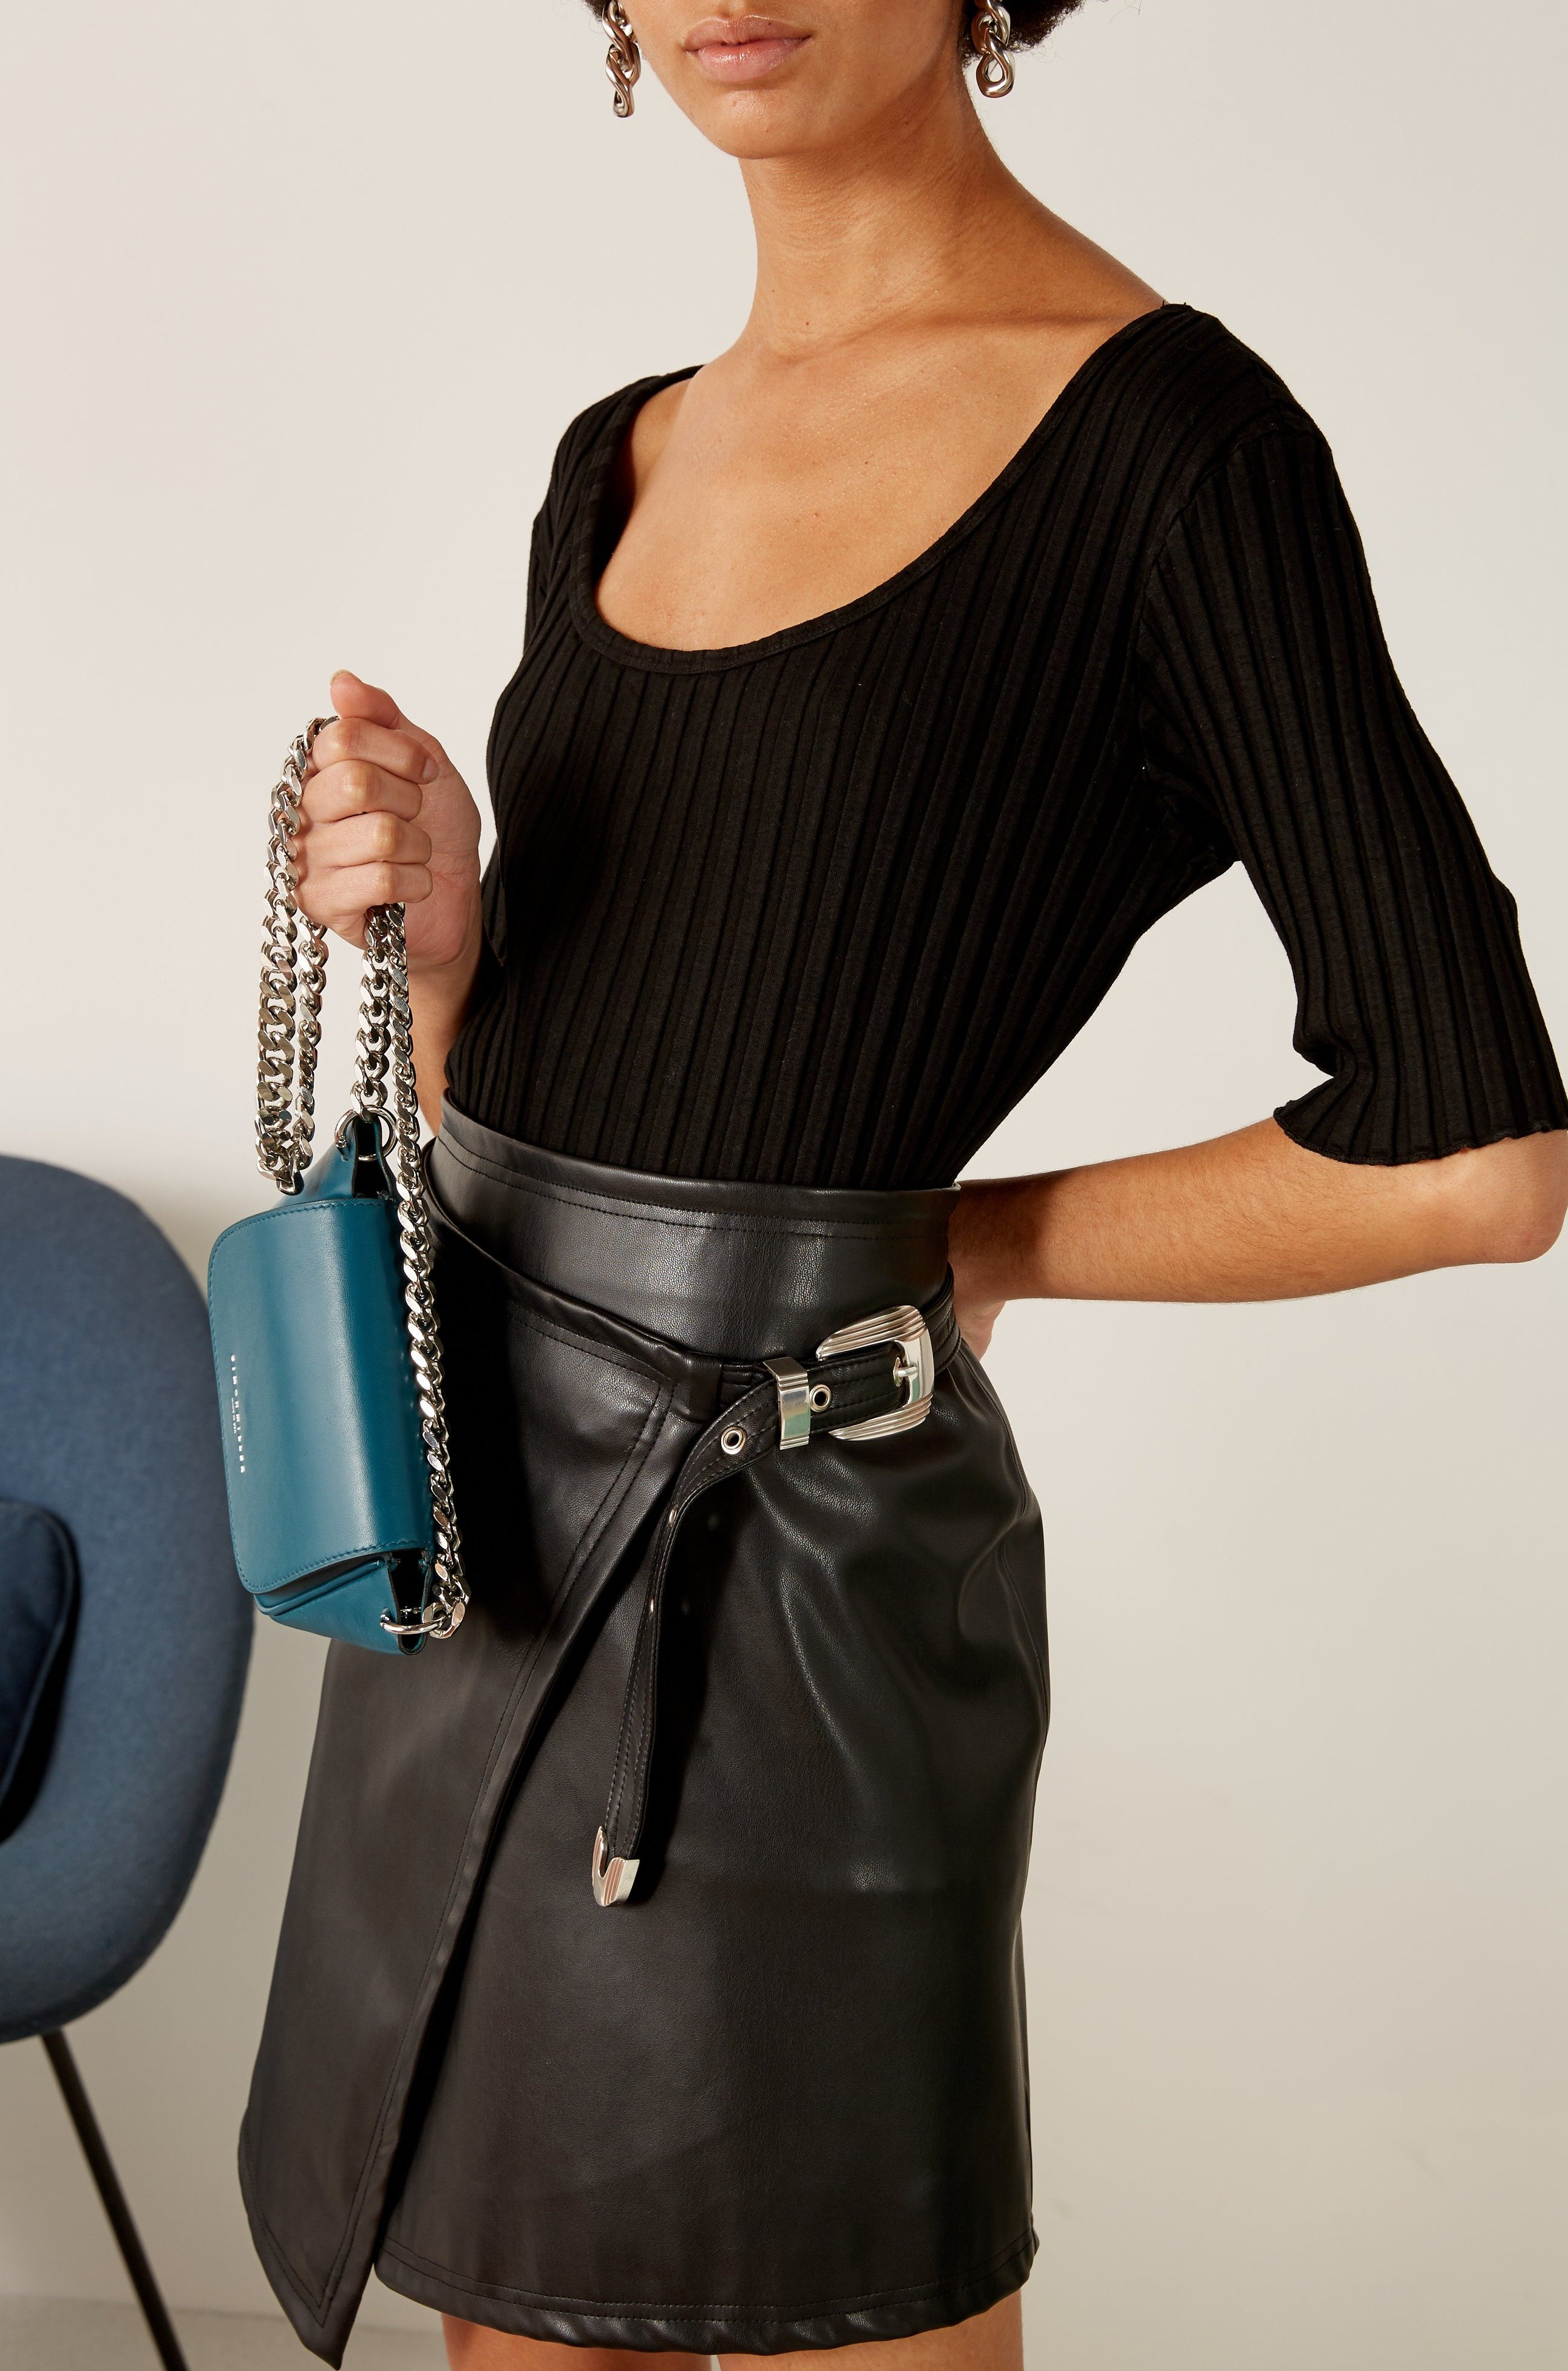 VEGAN Zamora Wrap Skirt in Black by Simon Miller - 2